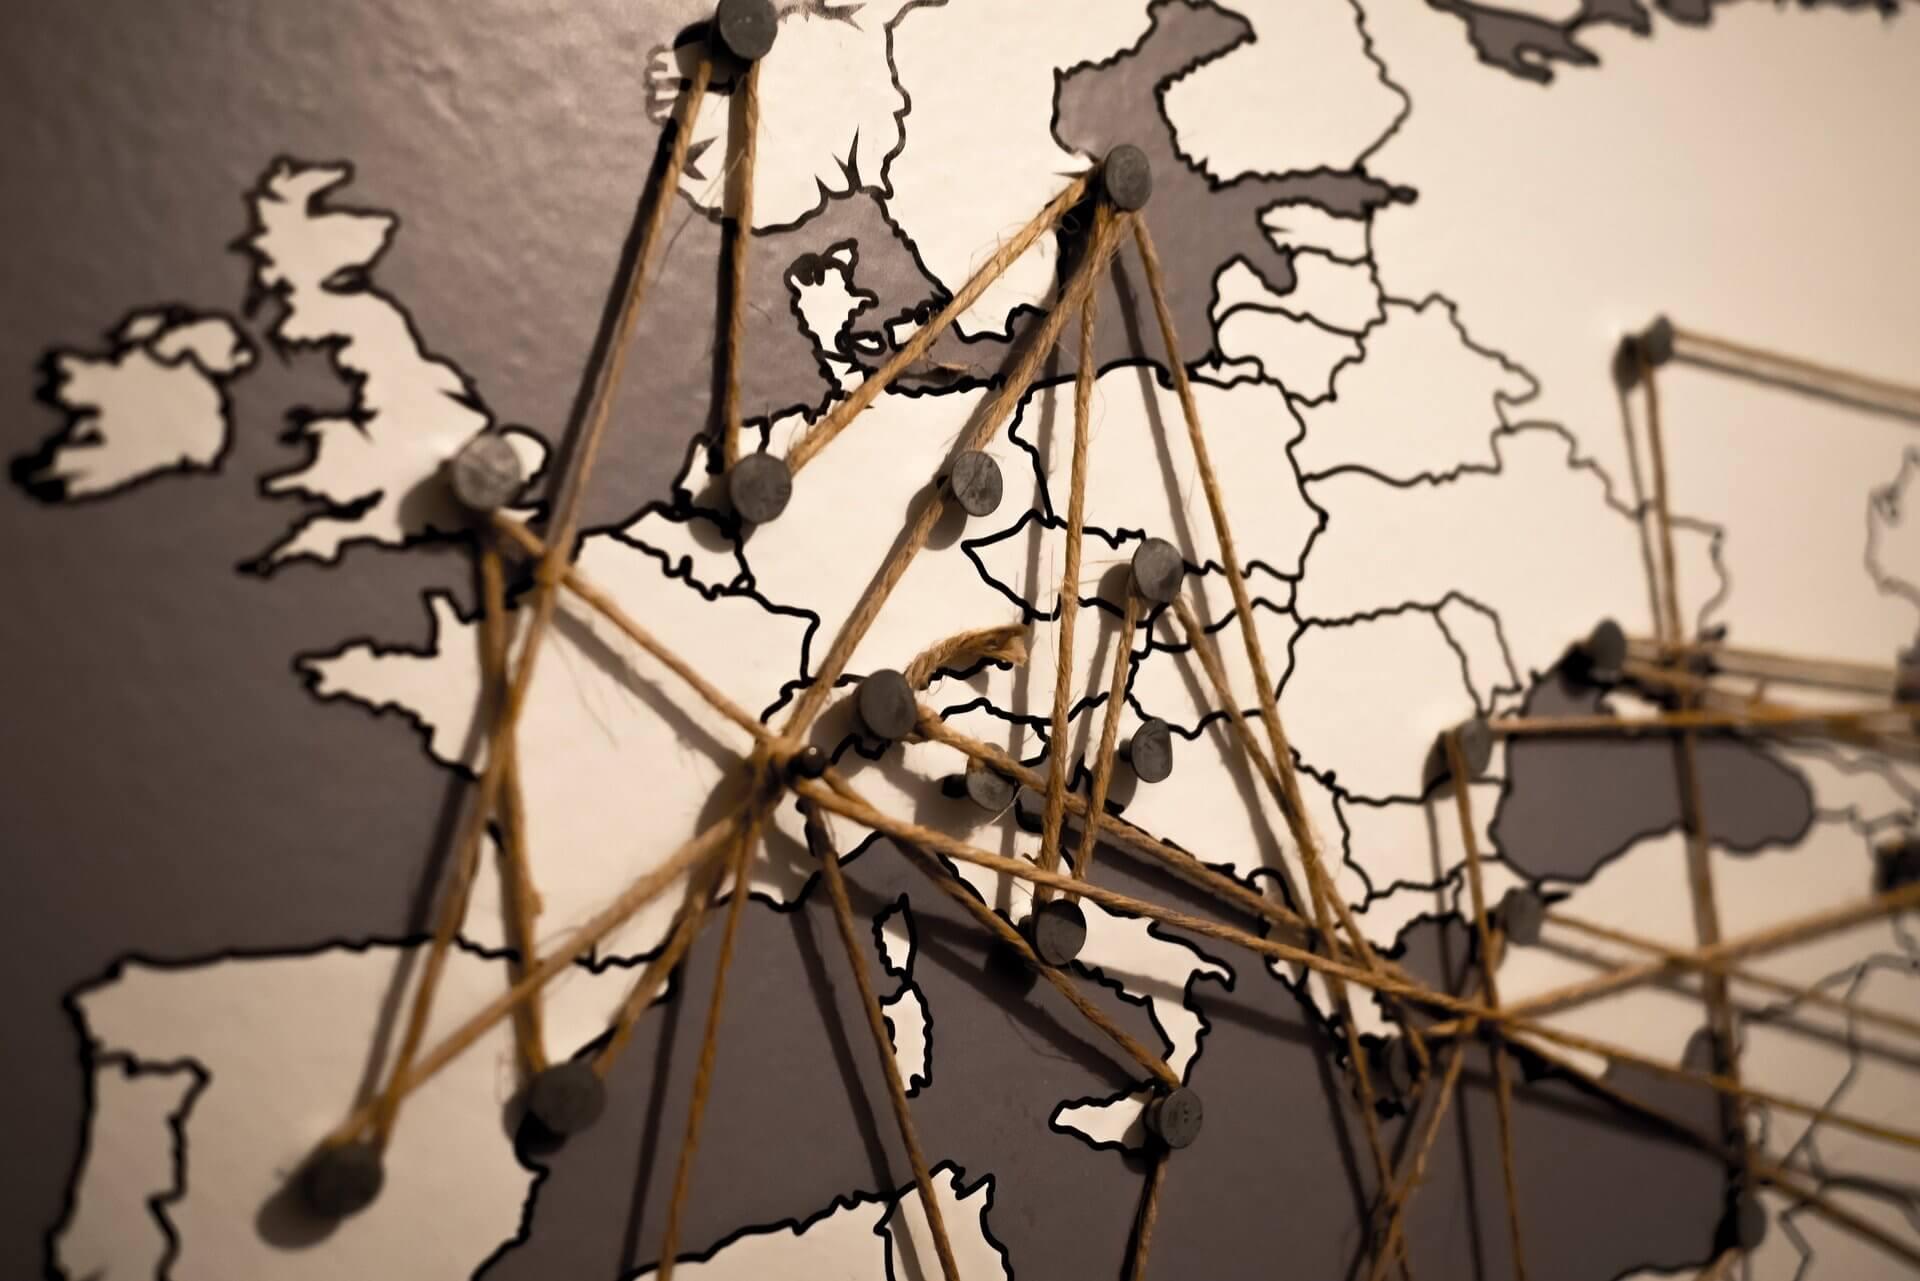 European economy had slowdown in December